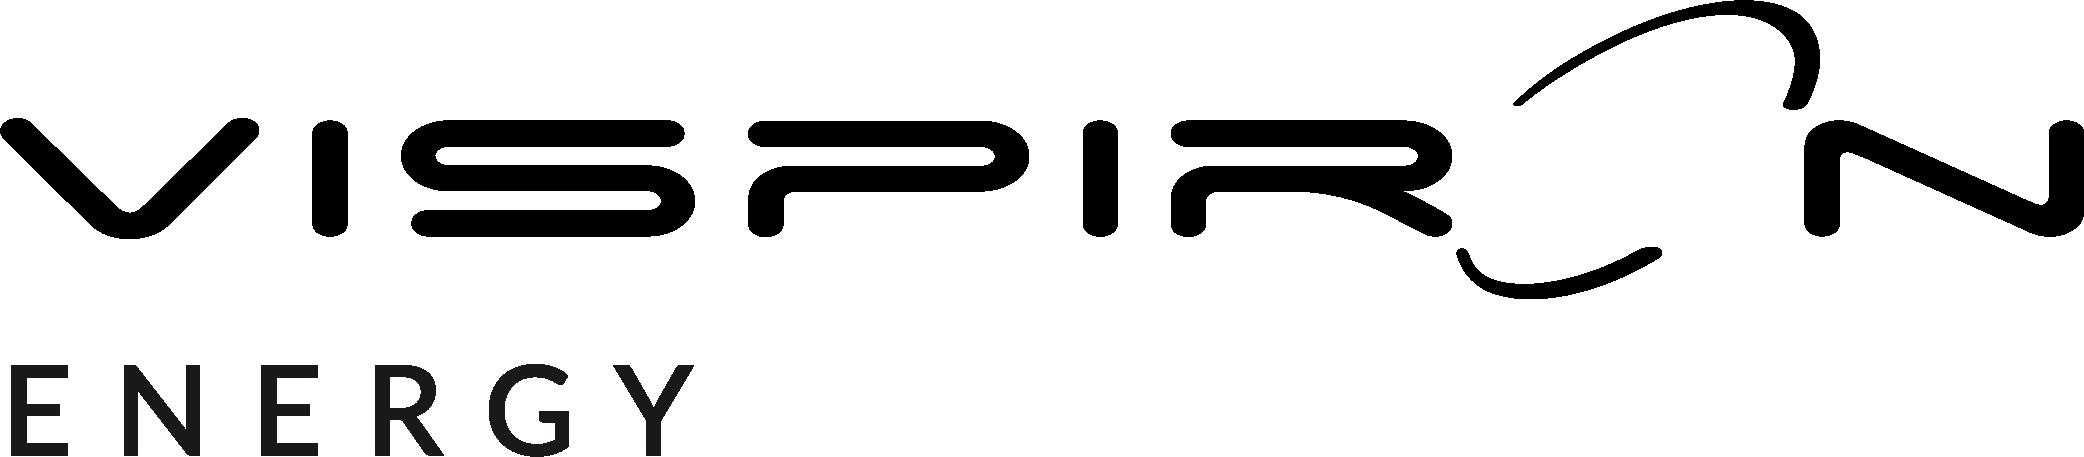 Vispiron-Energy_logo_black